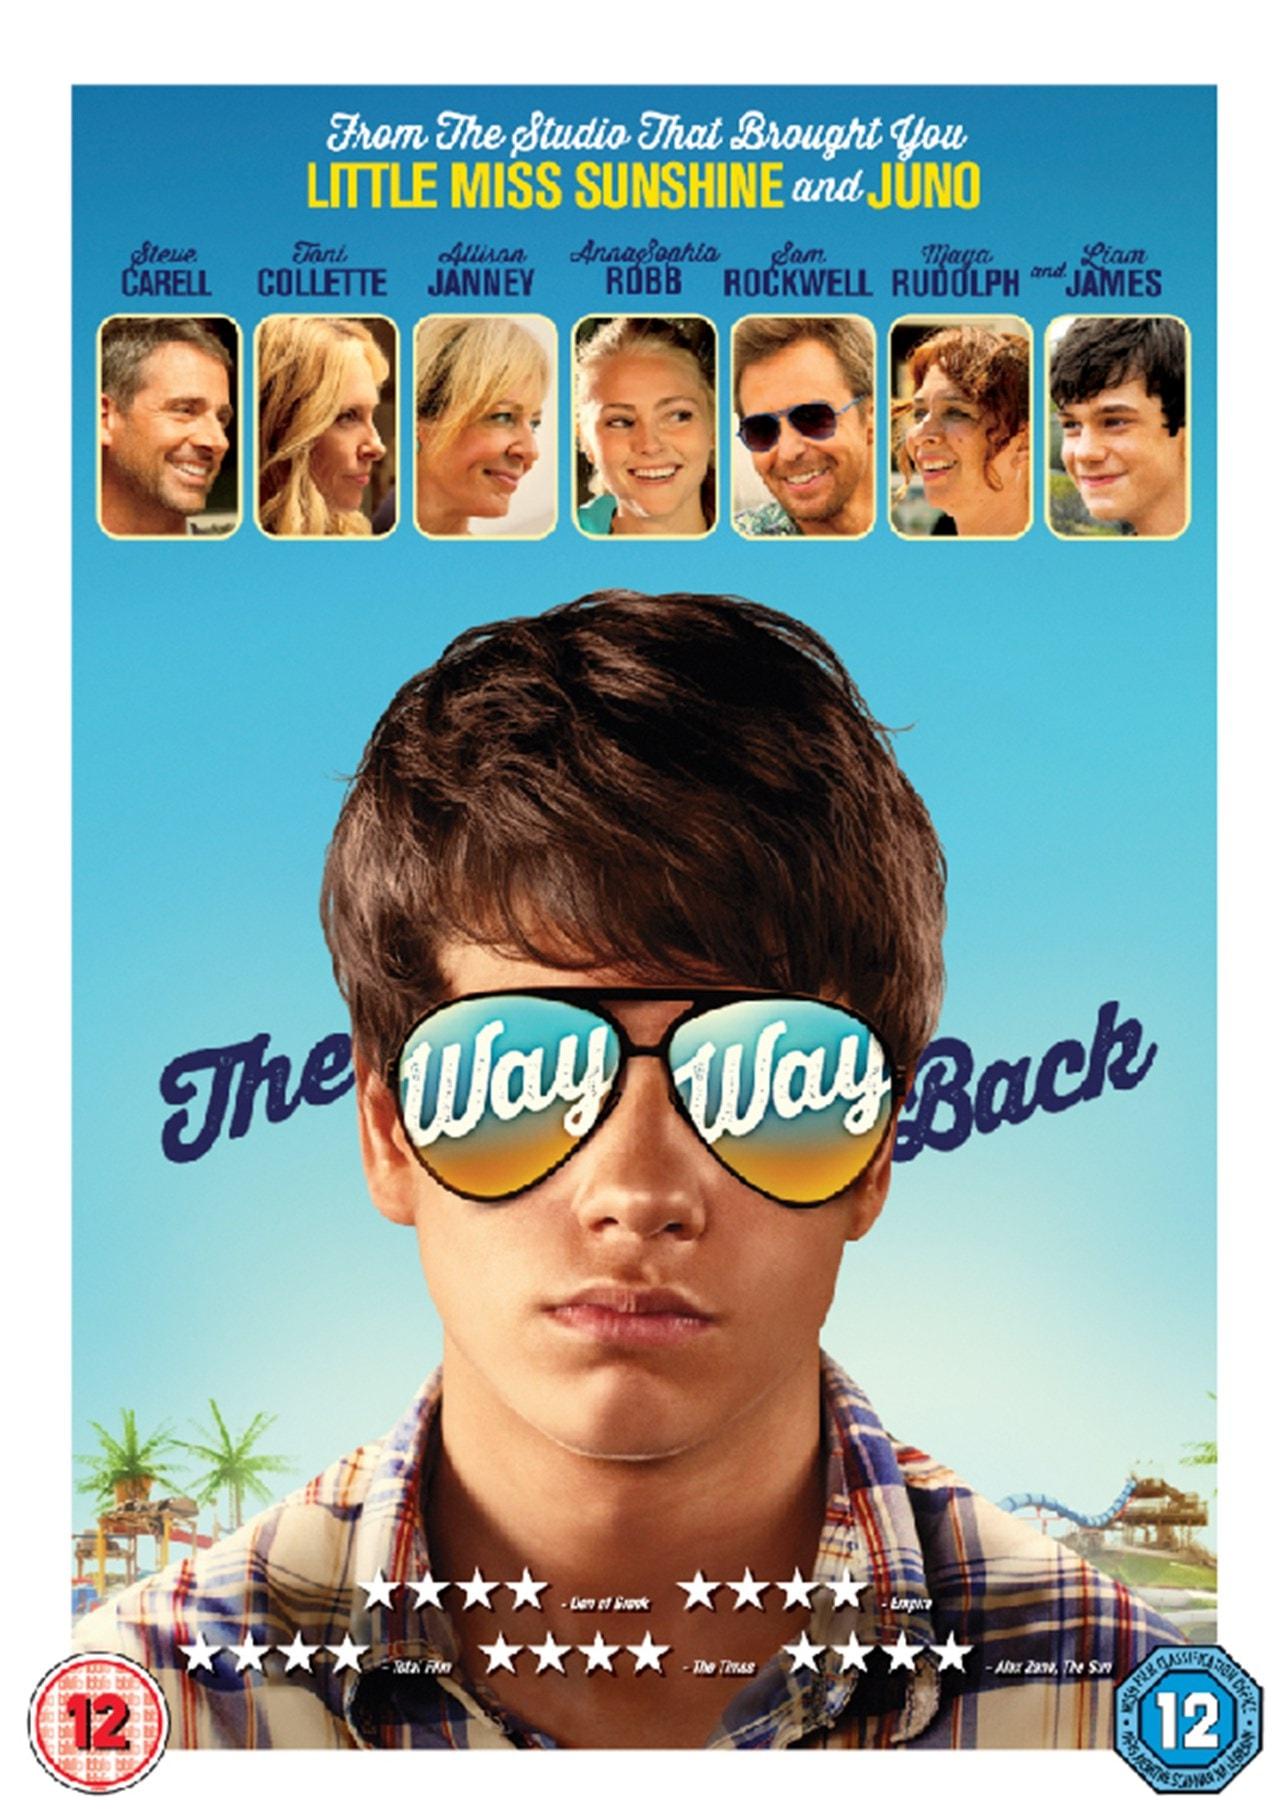 The Way, Way Back - 1